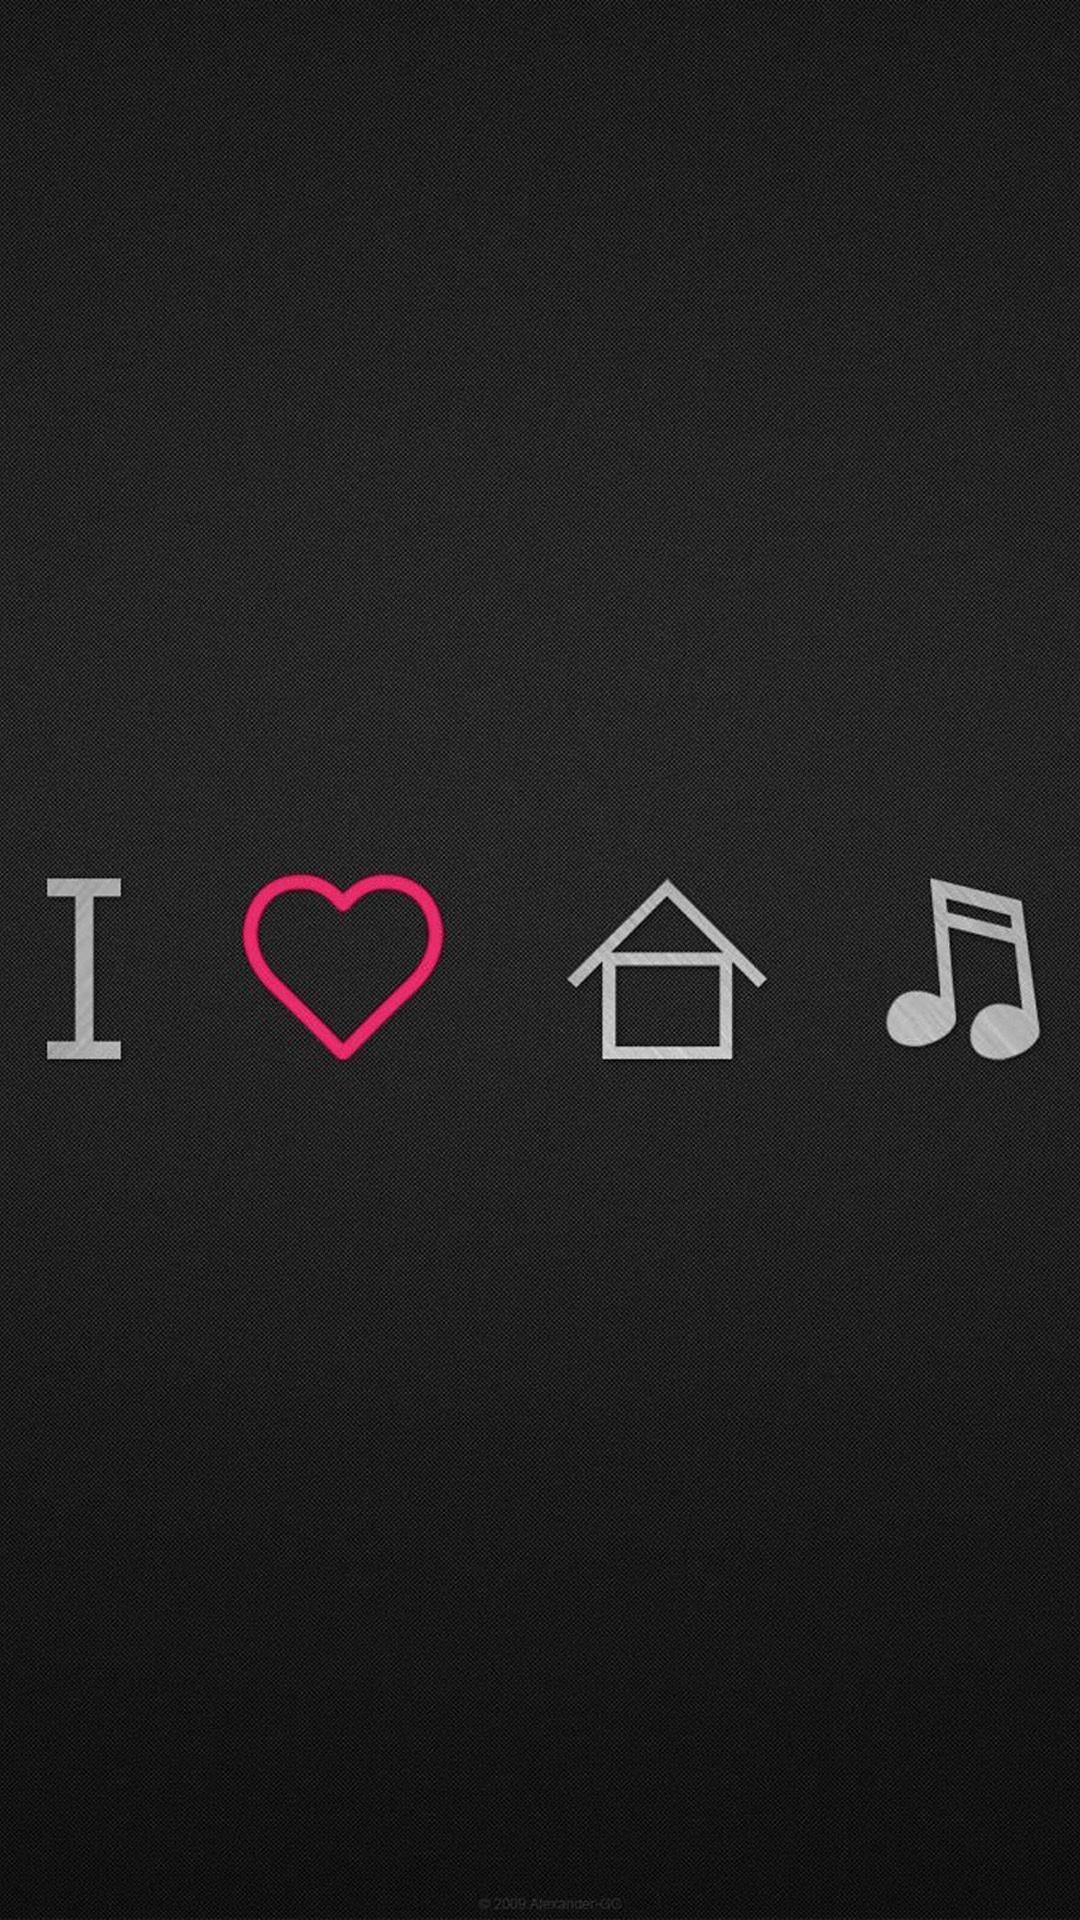 Music IPhone 6 Plus Wallpaper